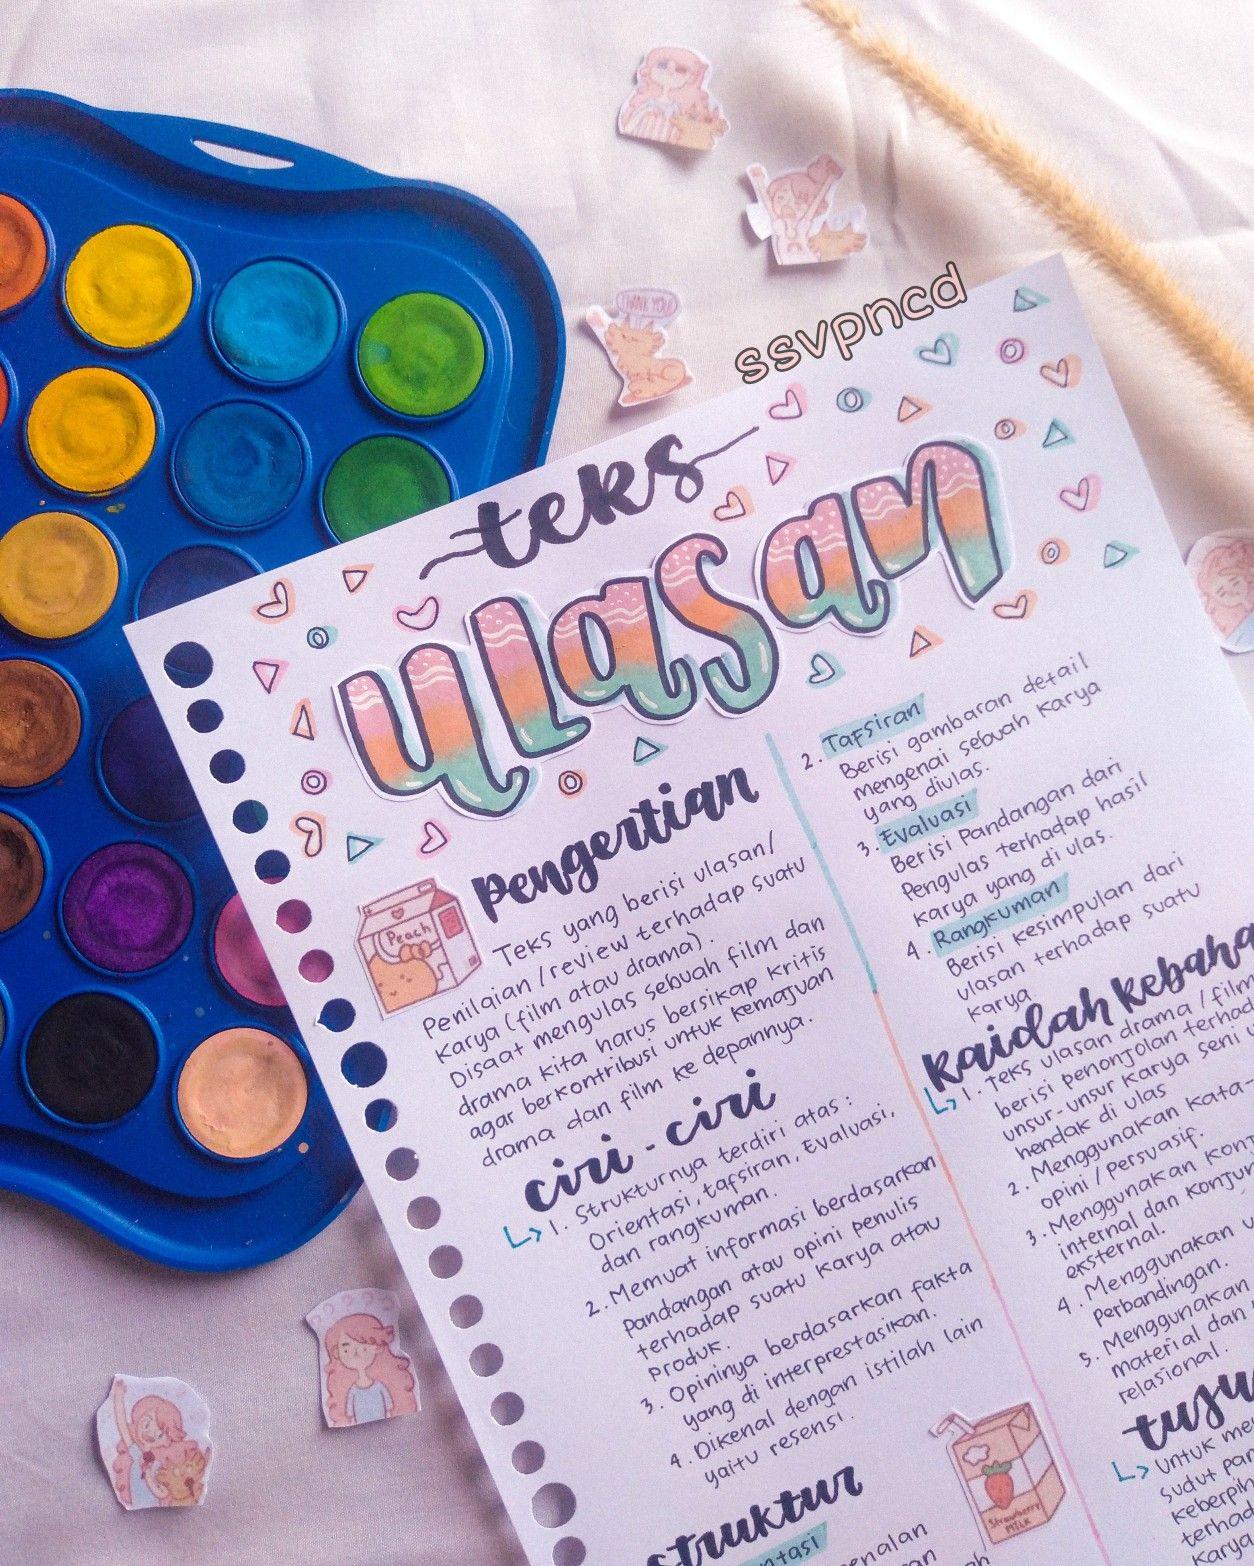 Teks Ulasan Huruf Doodle Buku Pelajaran Buku